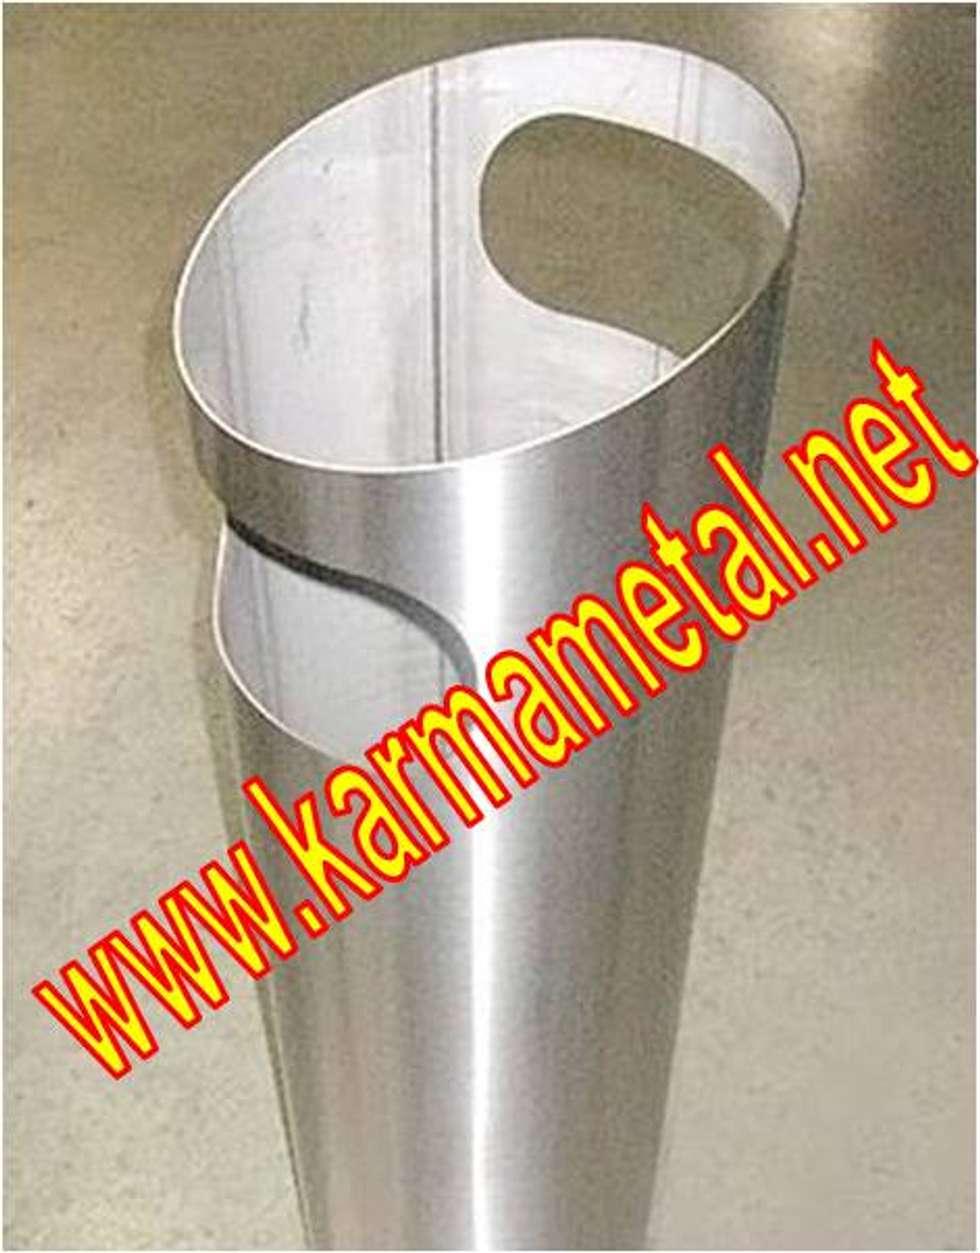 KARMA METAL – KARMA METAL-cnc lazer boru kesim profil kesme kurt ağzı açma : endüstriyel tarz tarz Banyo